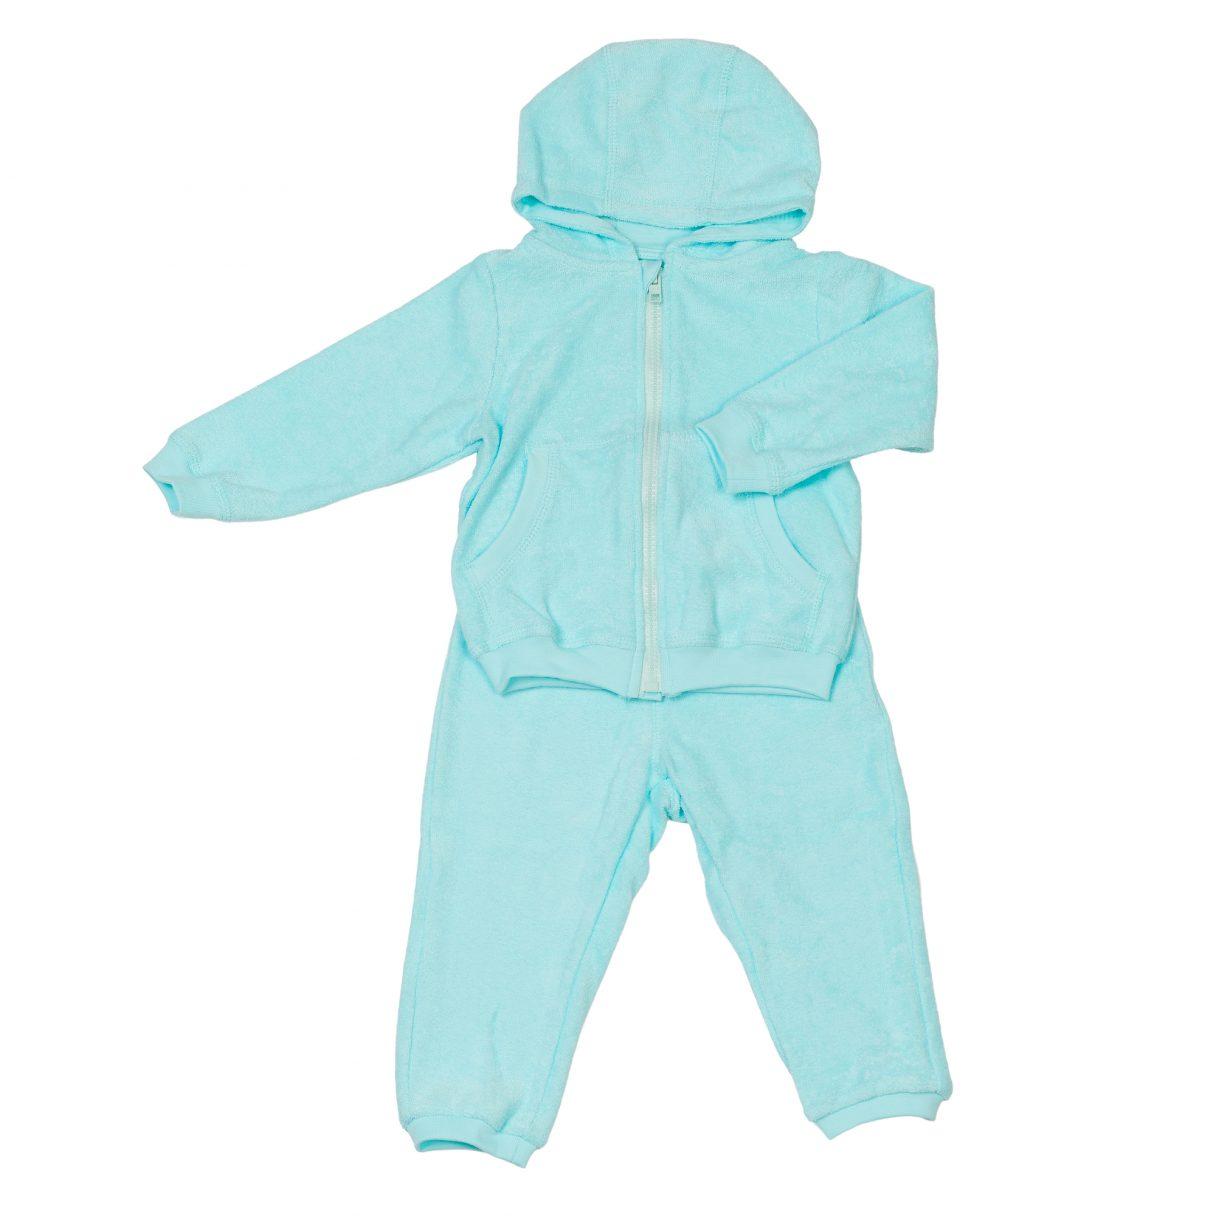 Baby Sweatsuit Organic Cotton Turquoise